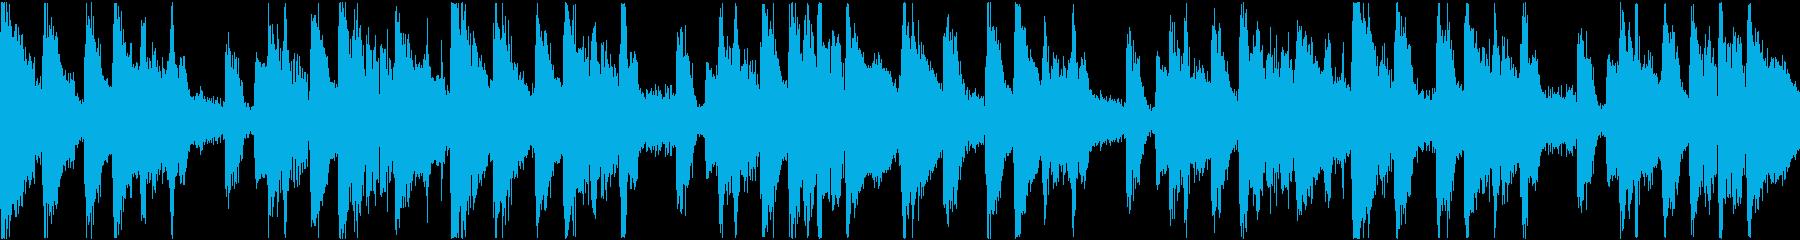 TikTok トランジション音源 ループの再生済みの波形